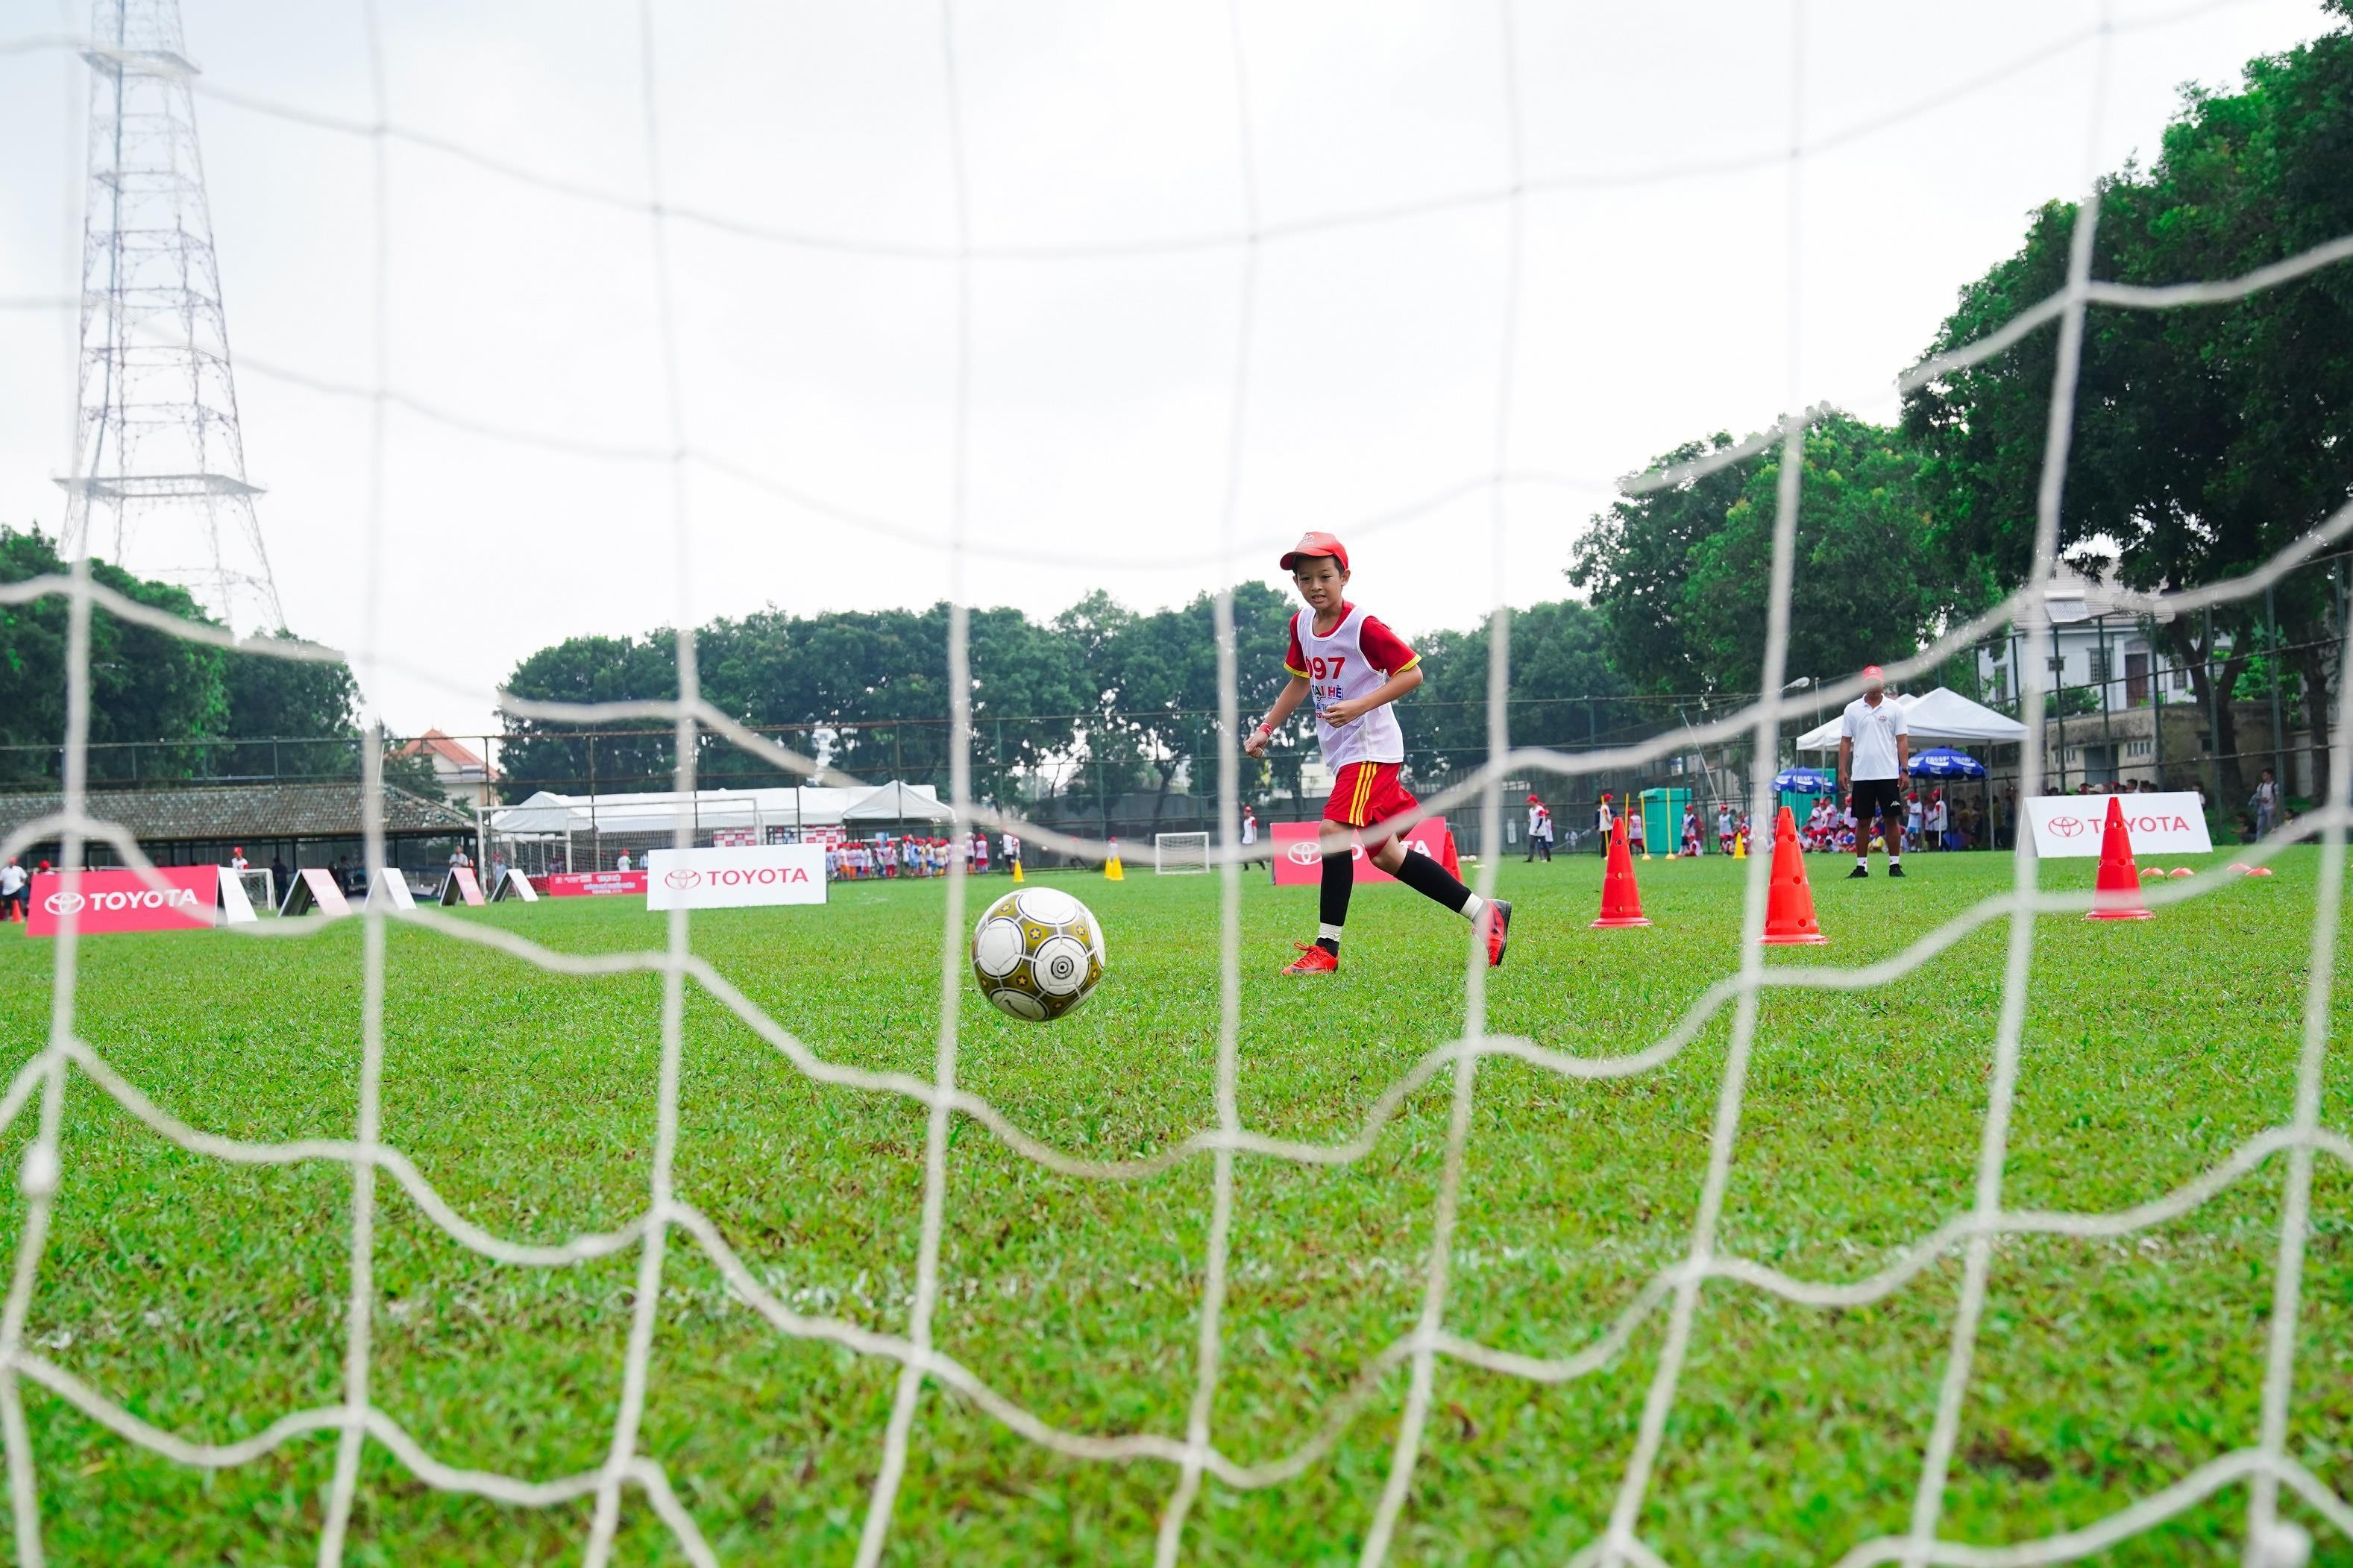 Toyota Junior Football - hanh trinh 'gieo uoc mo' cho cac cau thu nhi hinh anh 12